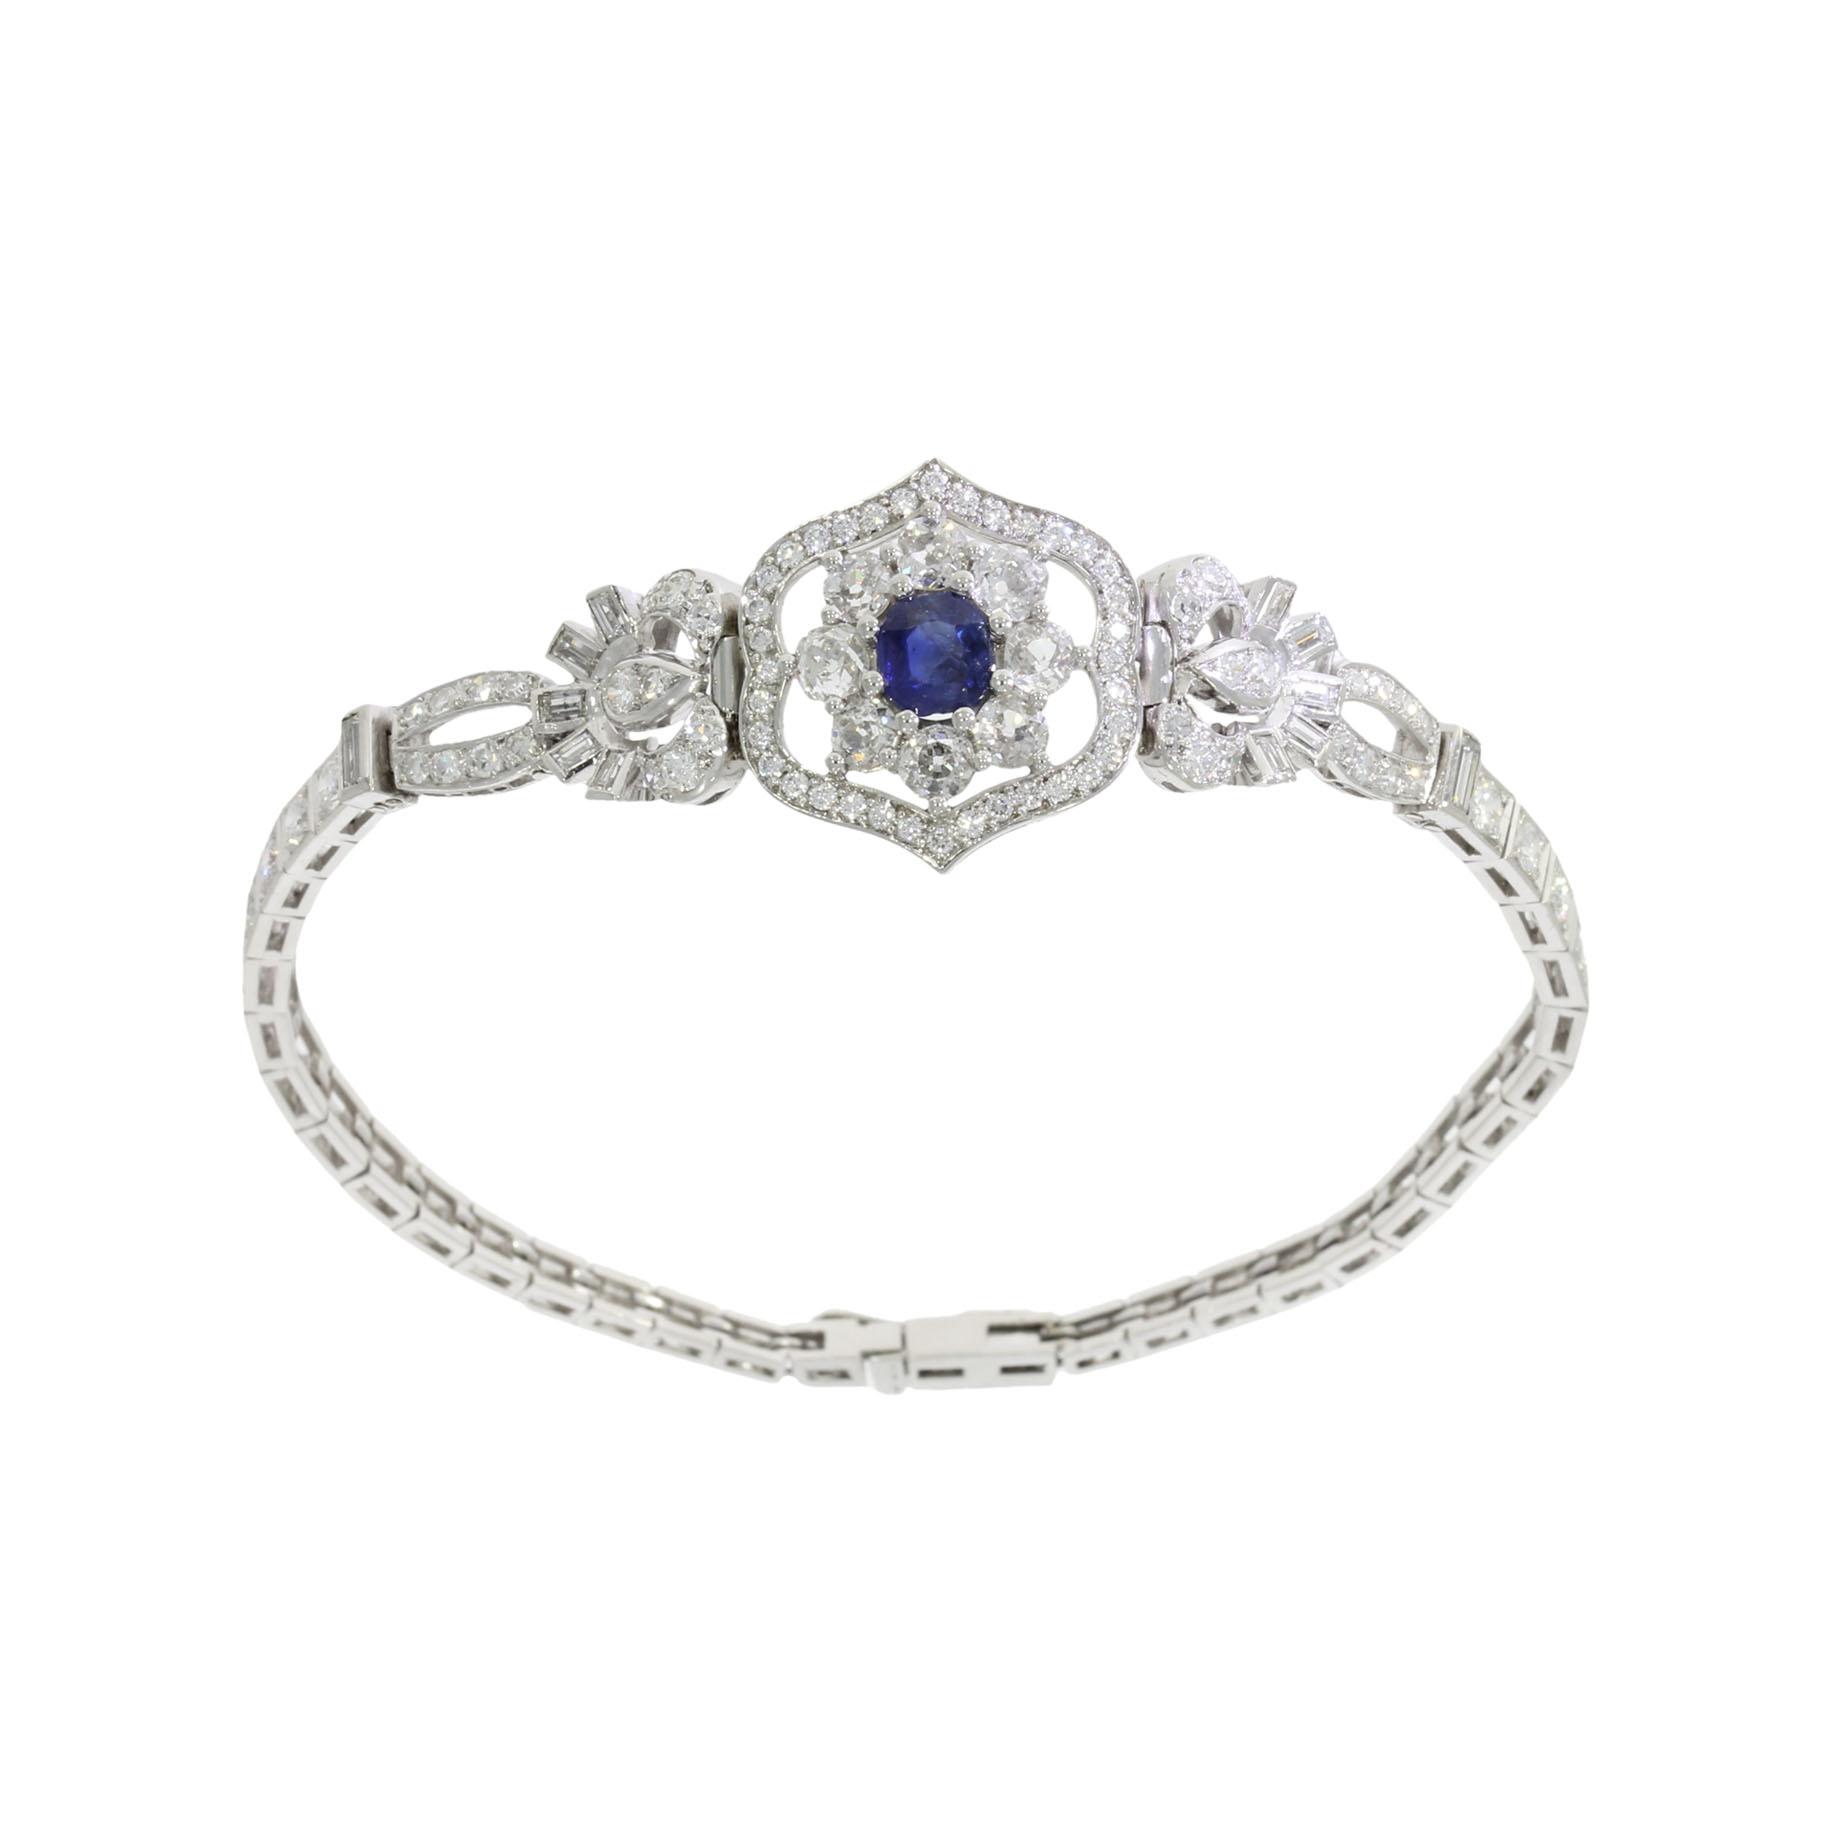 a 5ct blue sapphire and diamond art deco bespoke bracelet design made in bath uk